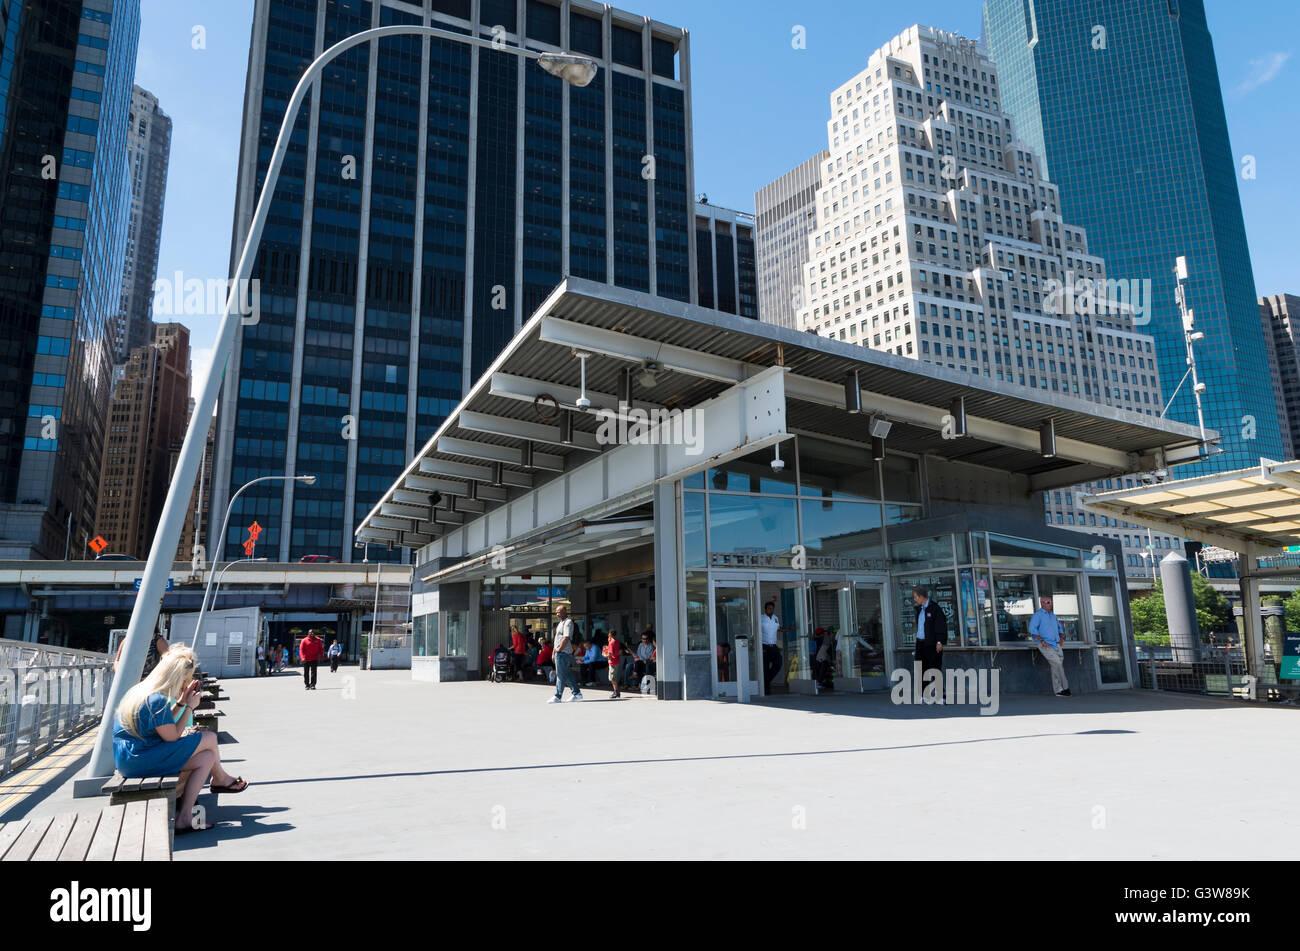 Pier 11 / Wall Street passenger ferry terminal in Manhattan, New York City - Stock Image